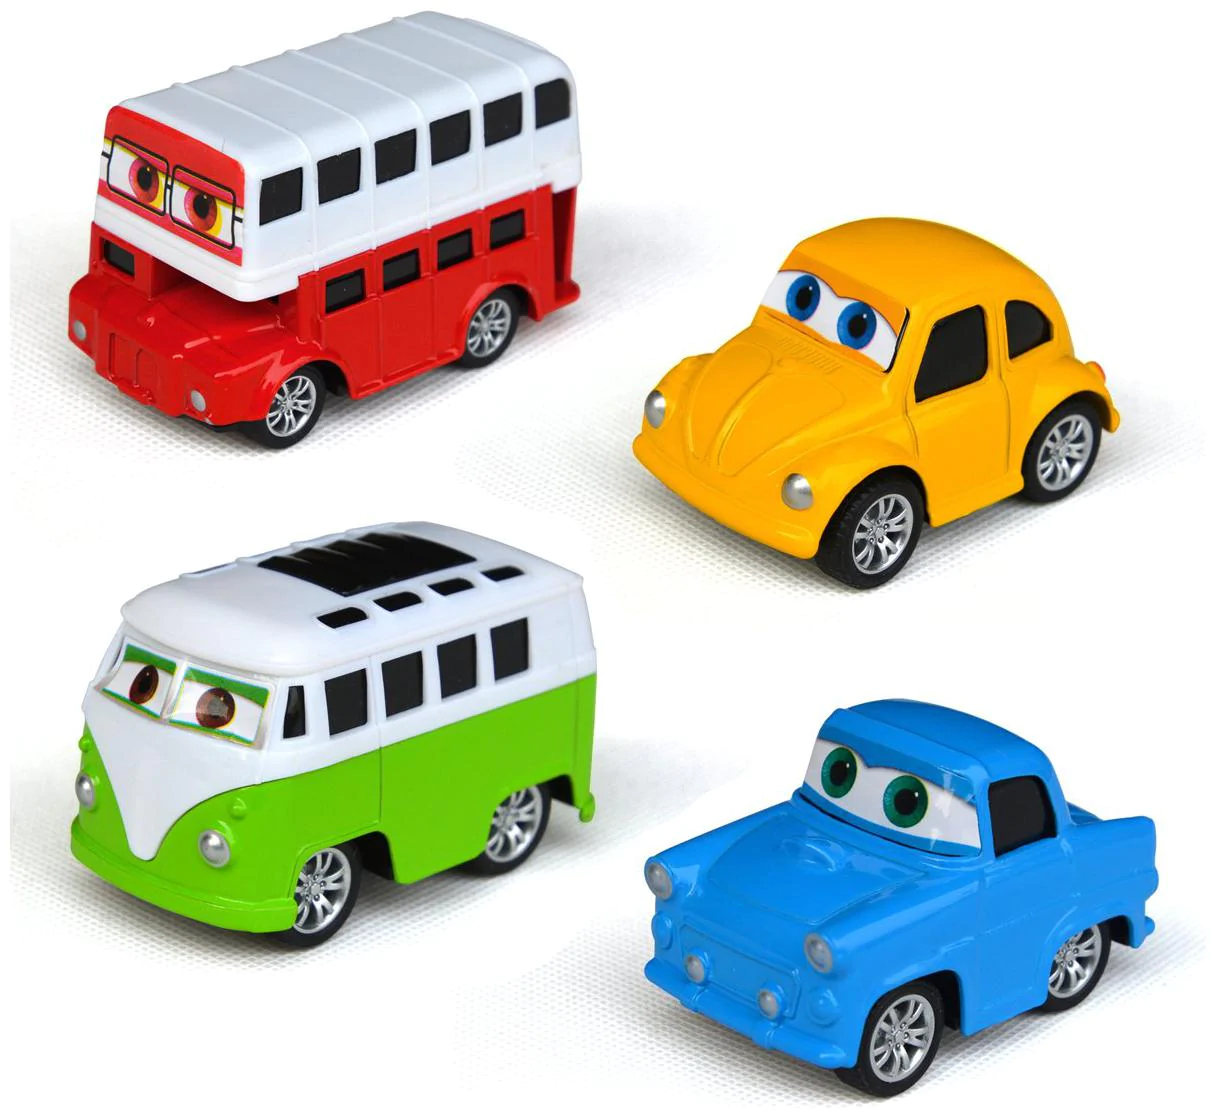 Pack of 4 Pcs Set - Cartoon Pull Back Metal Die Cast Vehicle Set Car, Bus, Foxy, Van Toys For Kids and Boys - Pullback Diecast